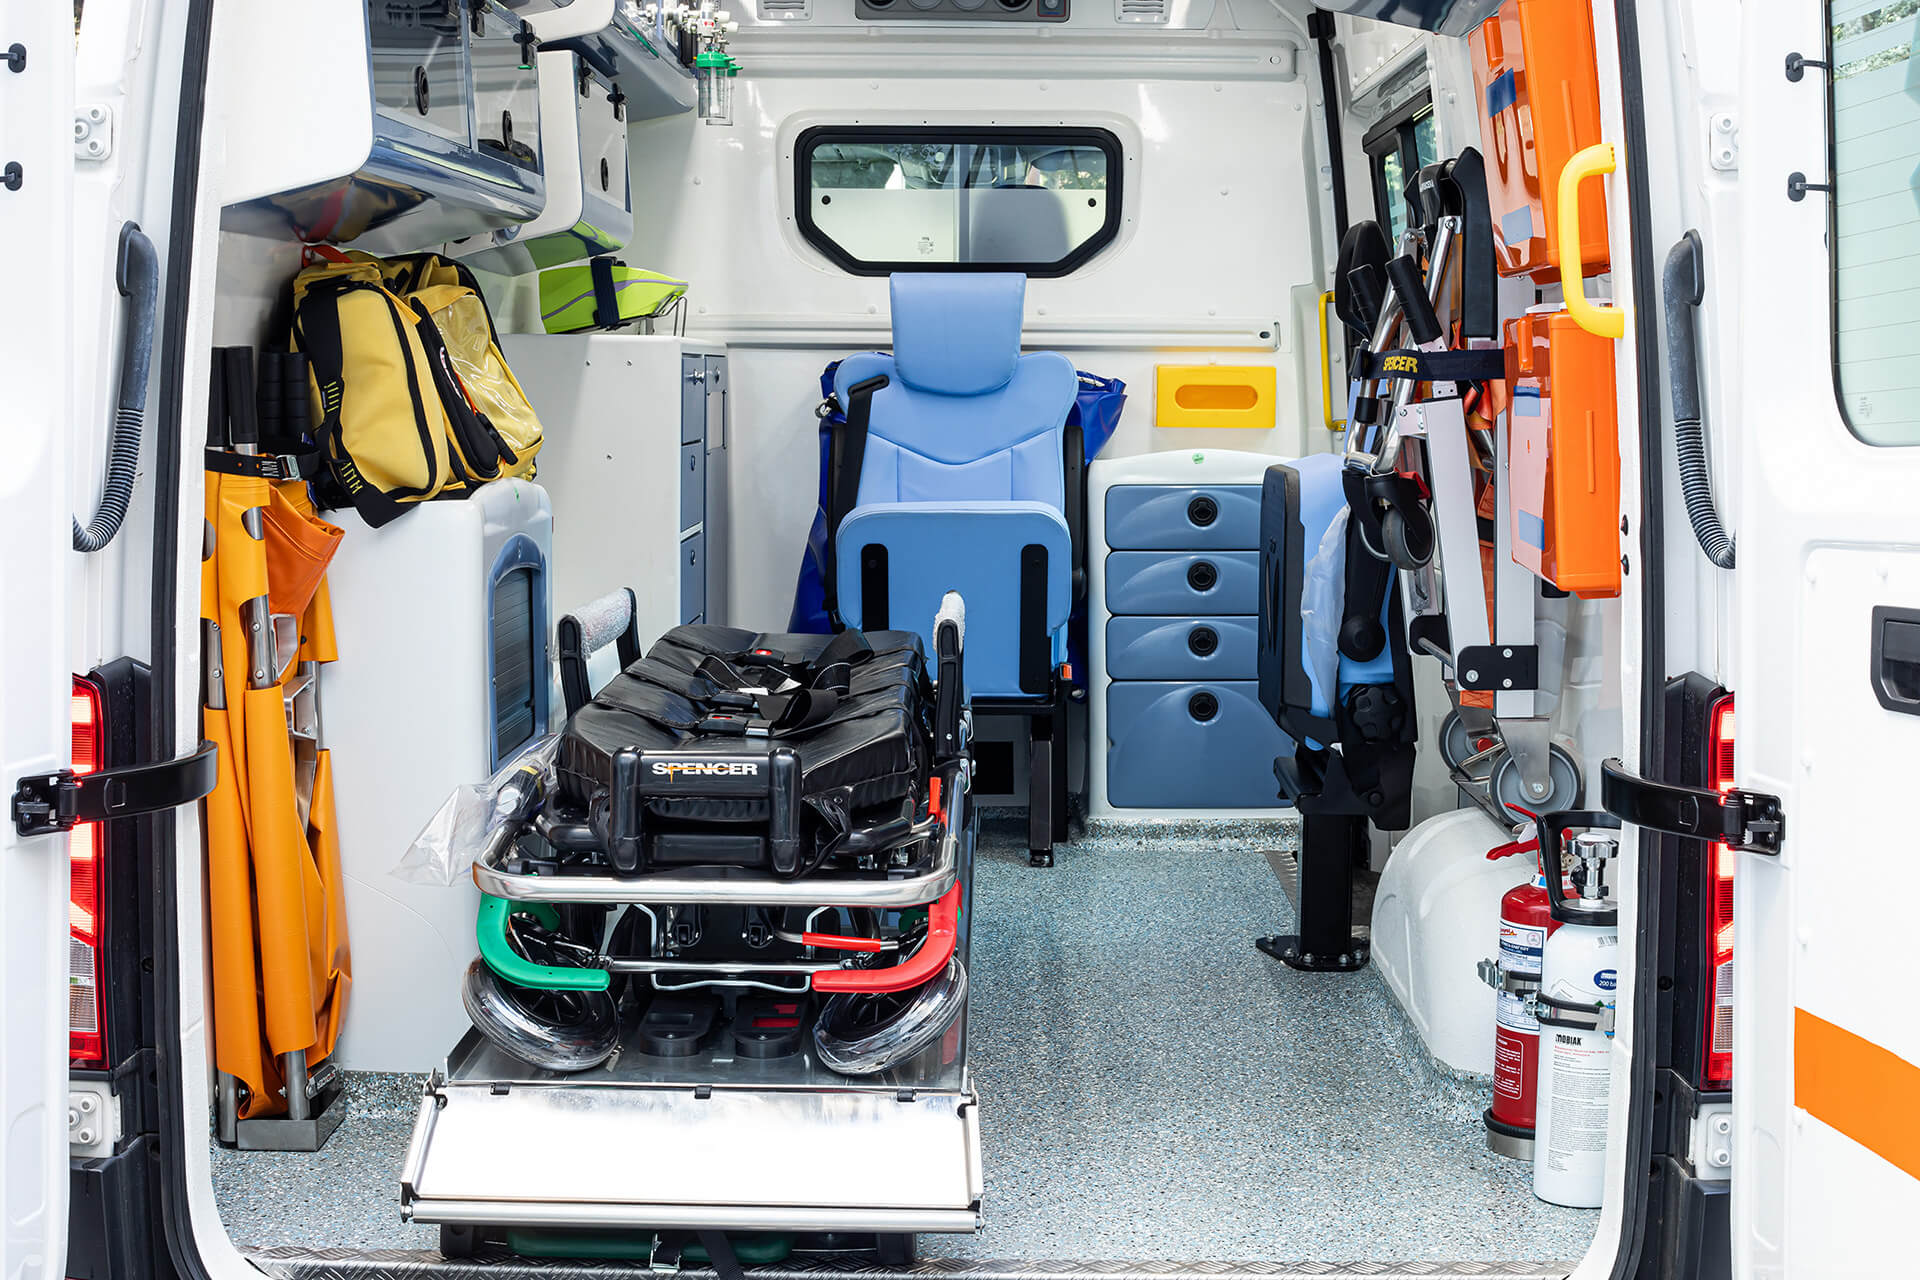 Kosmocar Δωρεά ασθενοφόρου Volkswagen Crafter στο Ε.Κ.Α.Β (3)